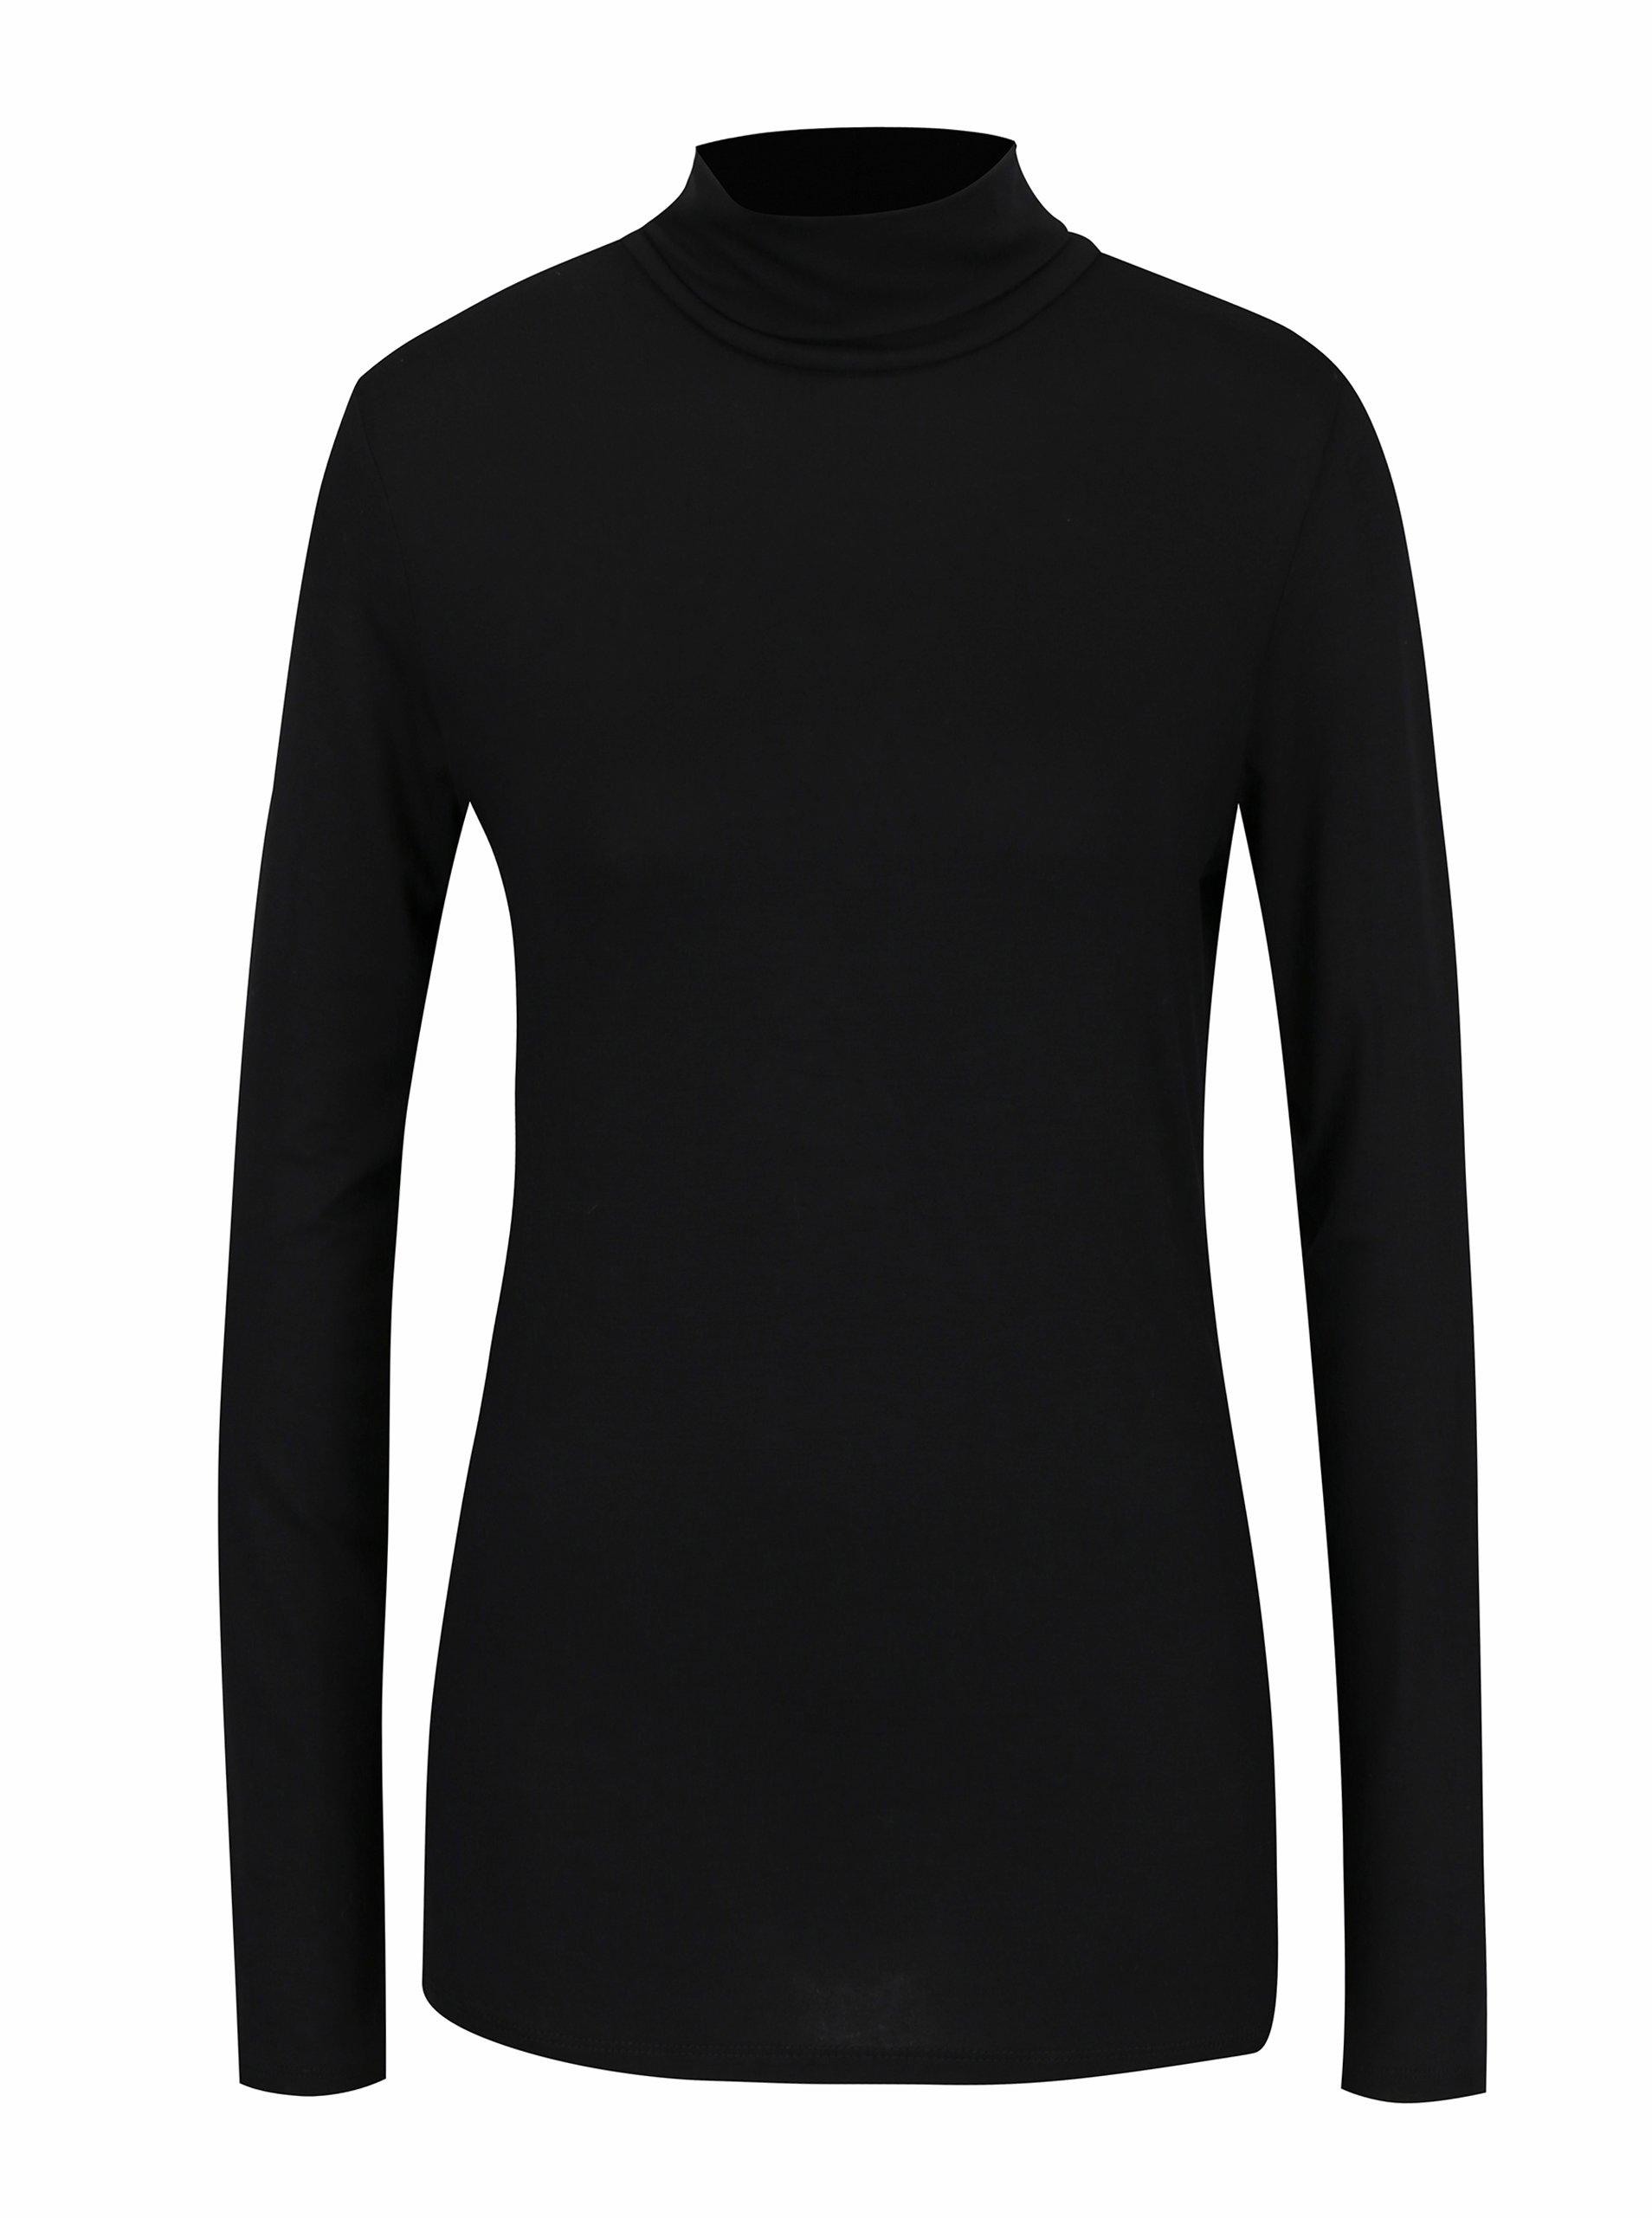 Černé tričko s rolákem Dorothy Perkins - Akční cena  76a0b29274